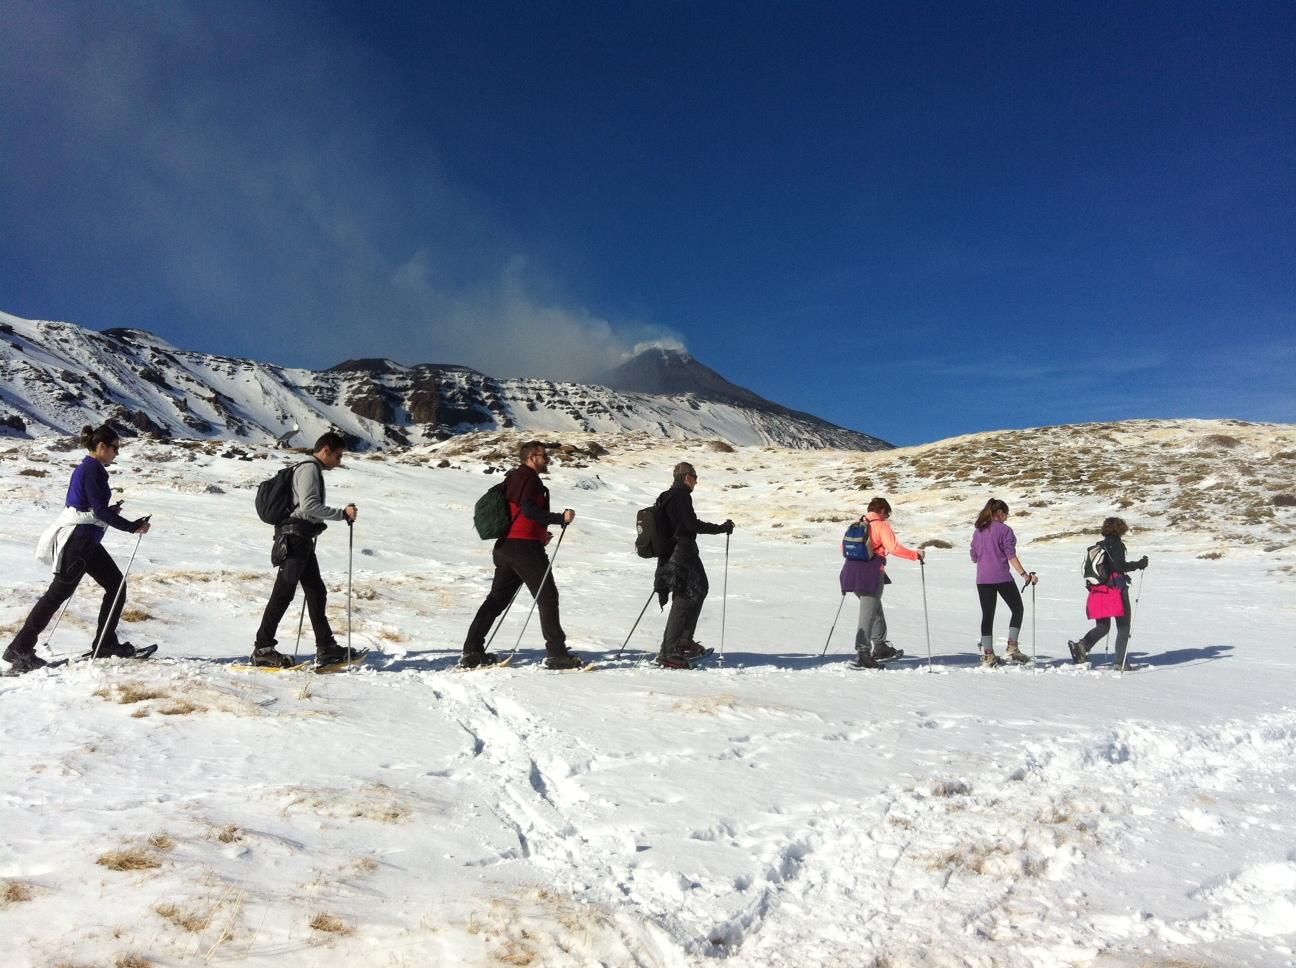 etna trekking tour snowshoes